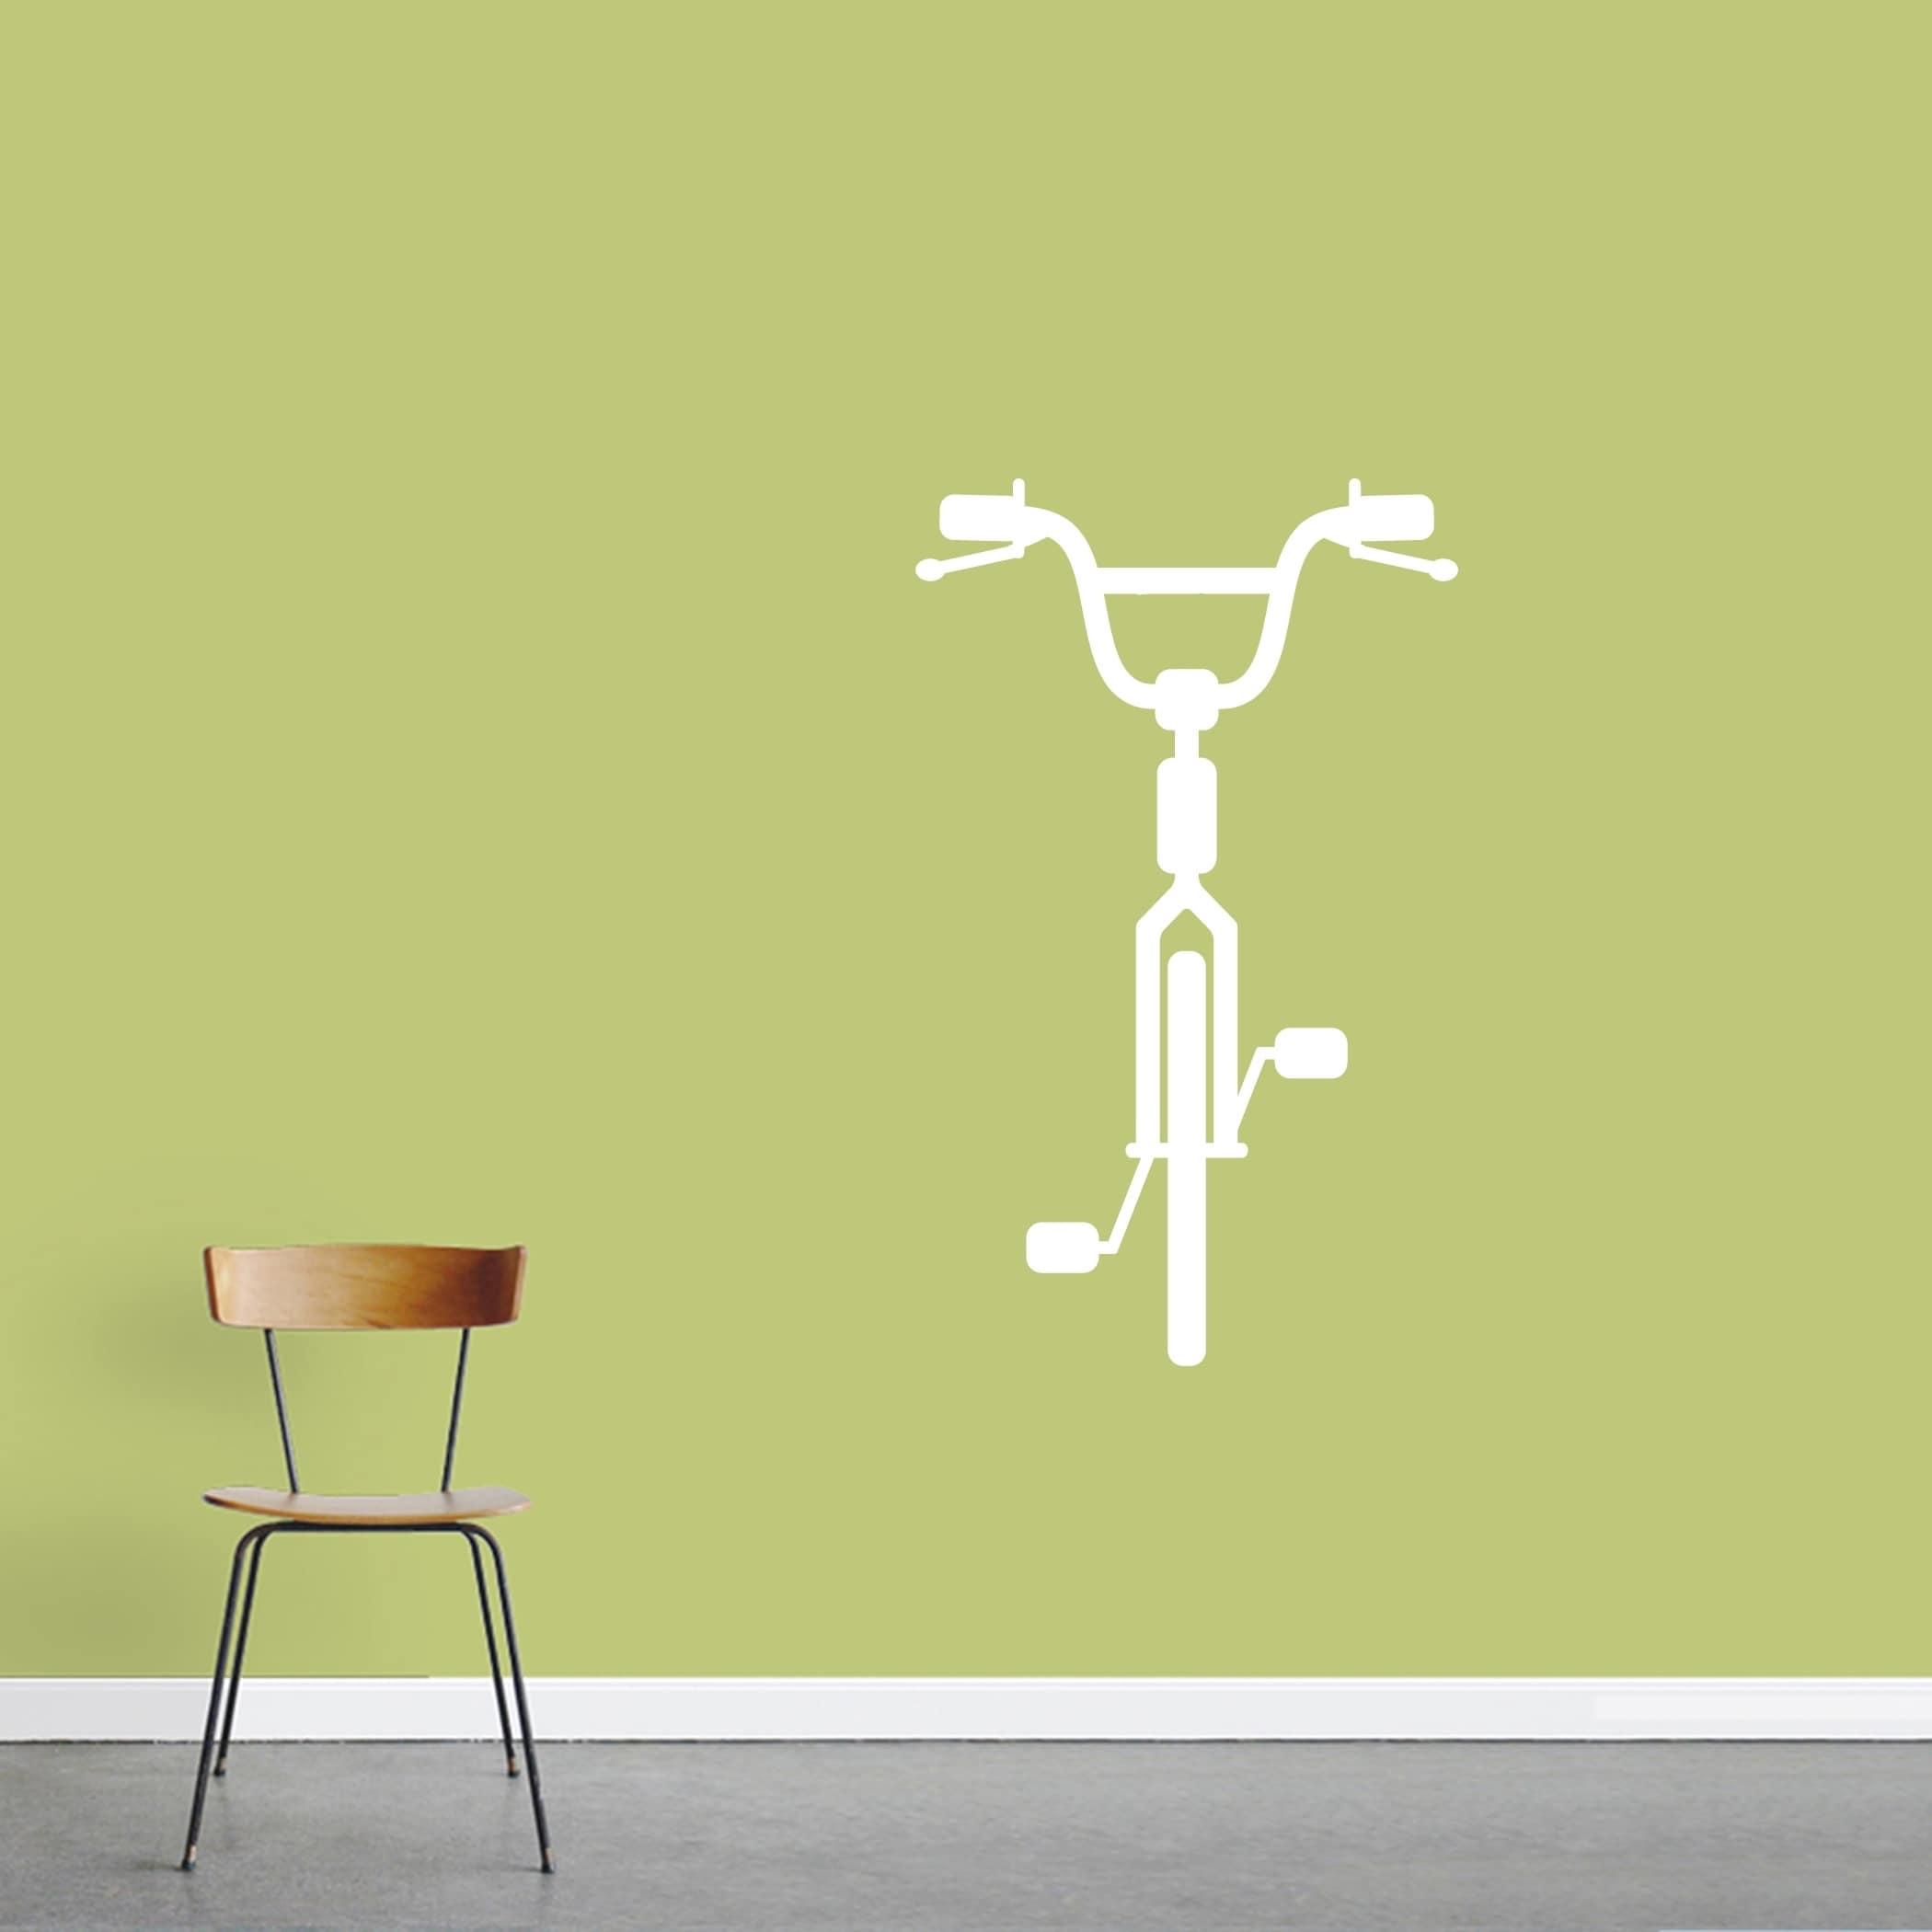 er Kinderzimmer  data-mtsrclang=en-US href=# onclick=return false; show original title 20 cm-Wall Tattoo Wall Sticker Bicycle Sticker Nursery Details about  /Name sticker